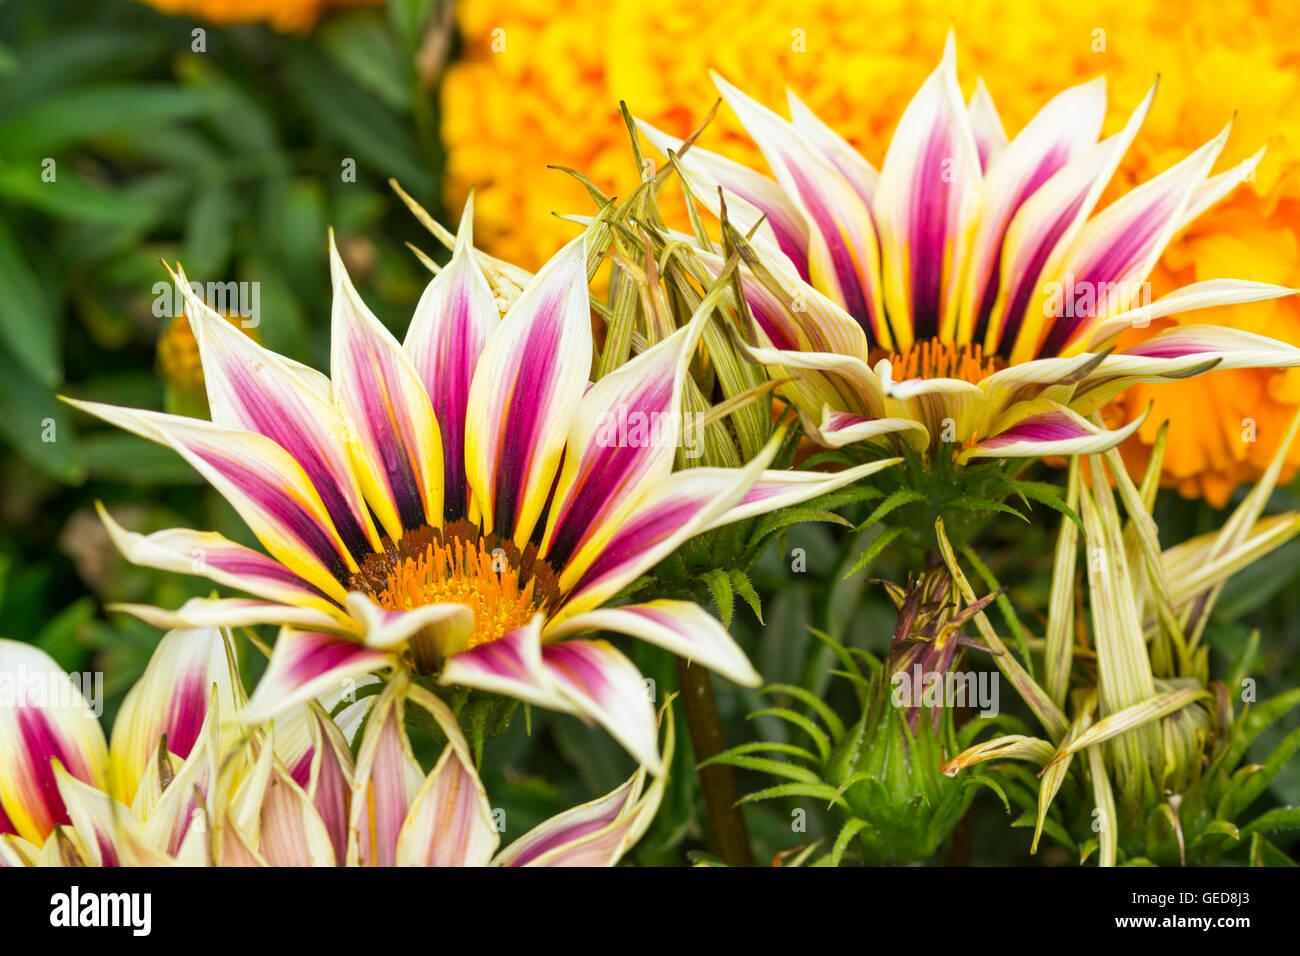 Gazania rigens ornamental garden plant, growing in the UK in Summer. Stock Photo